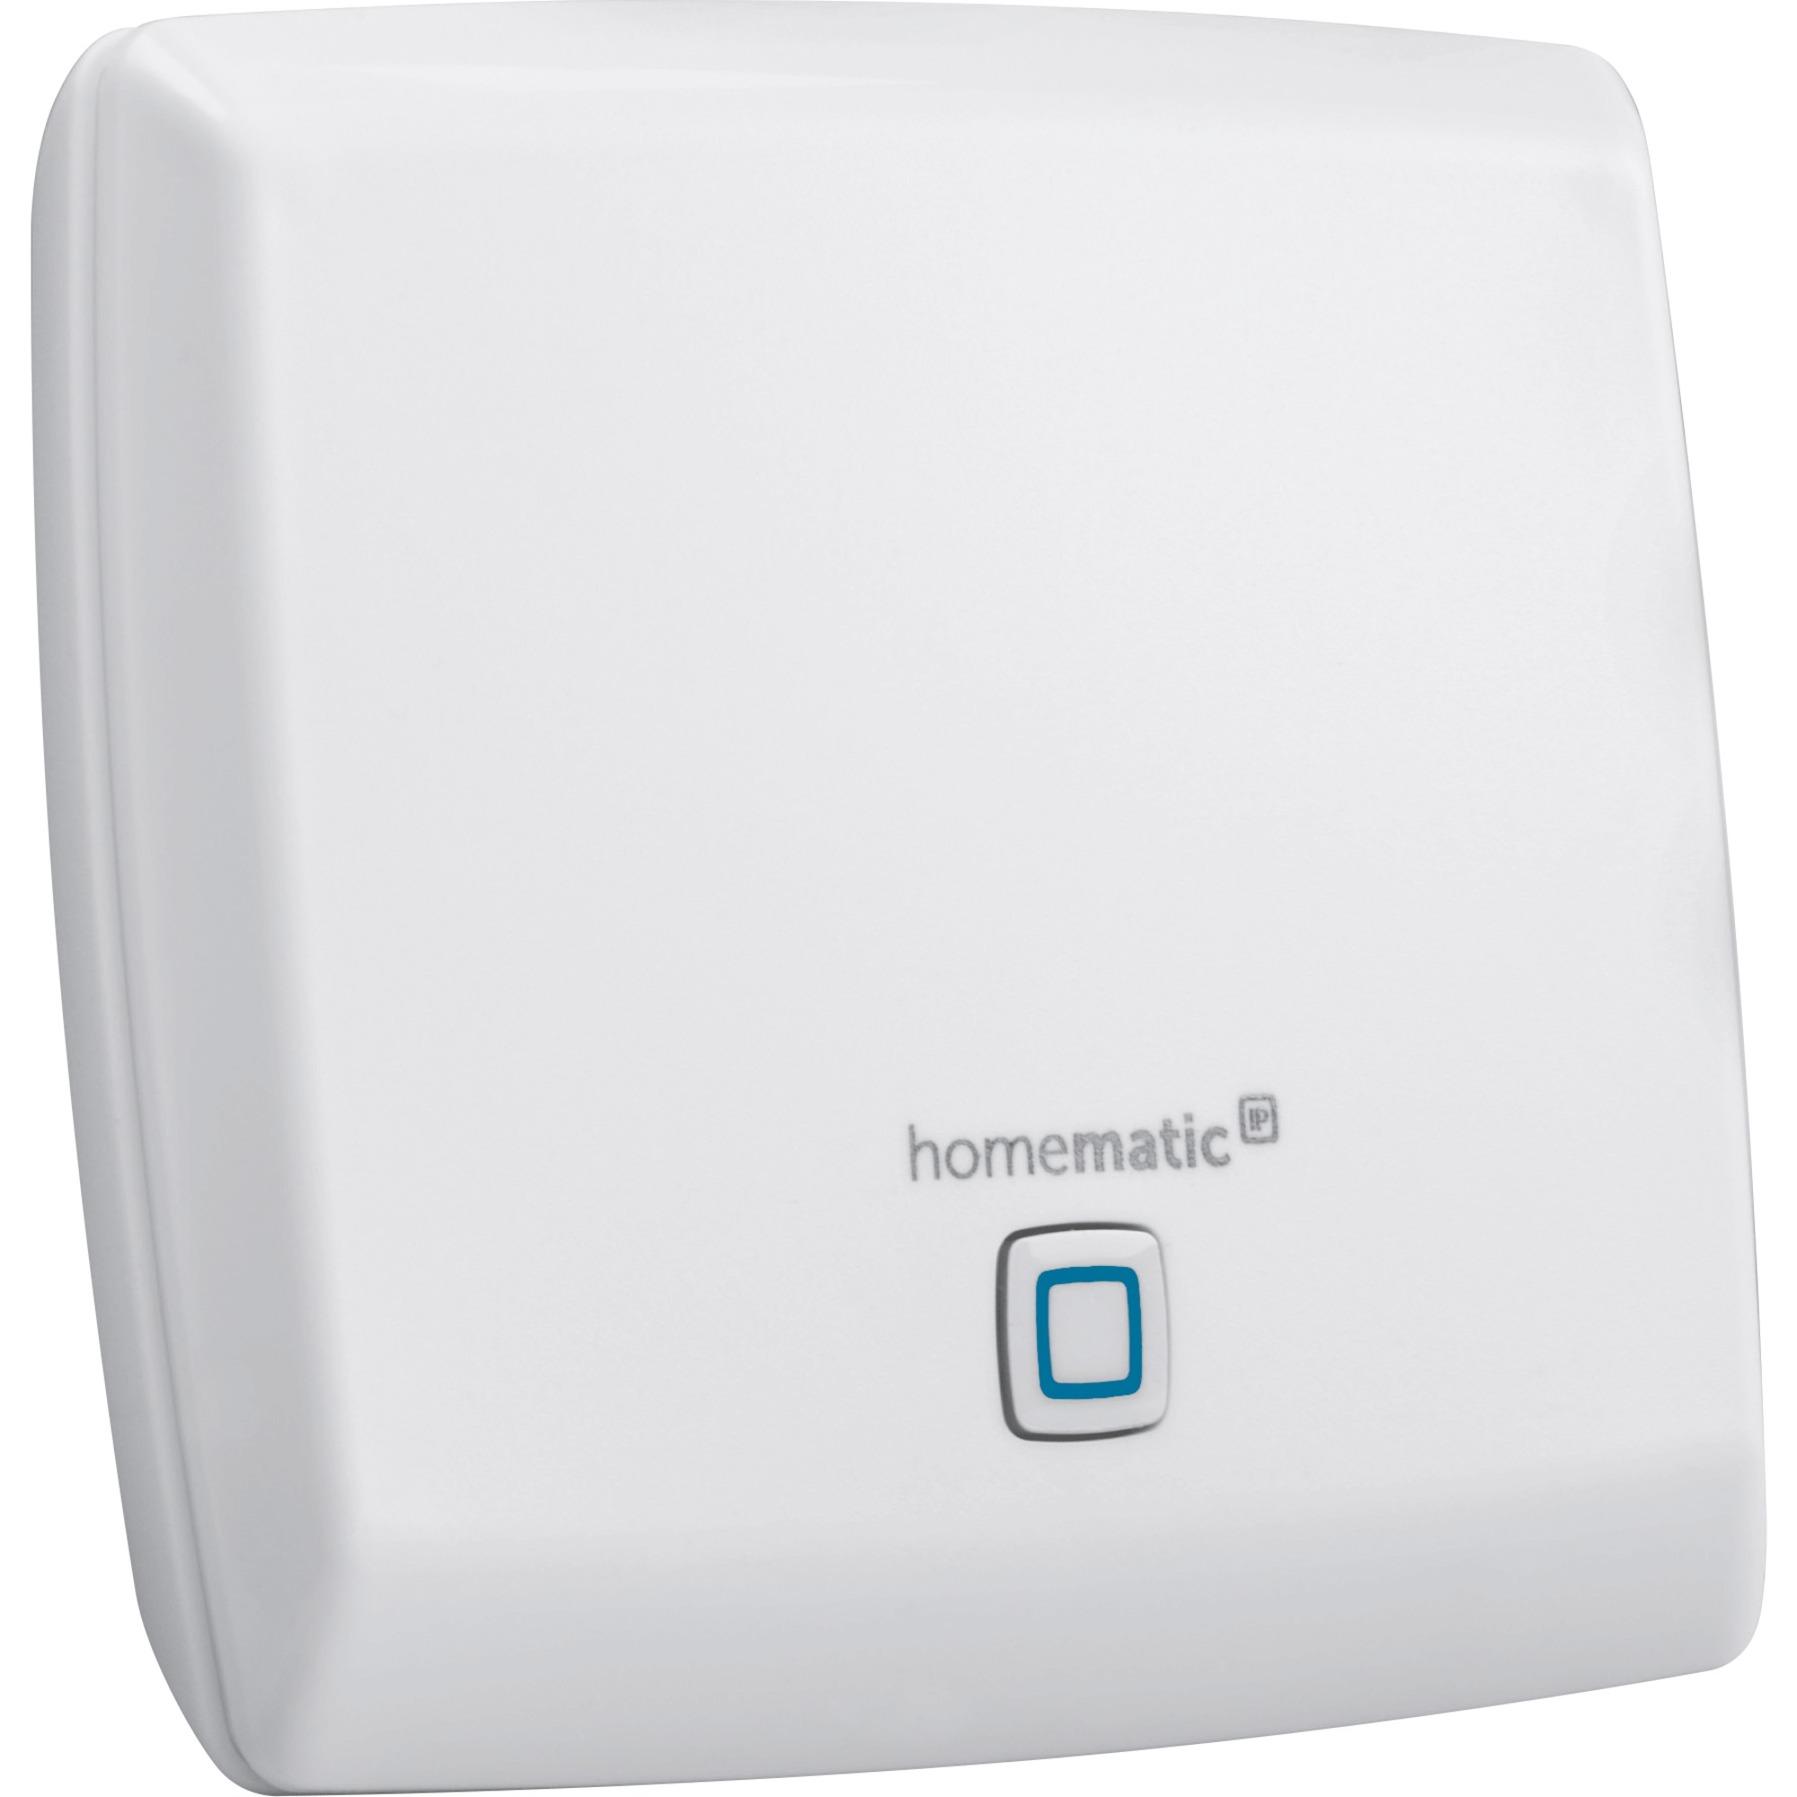 HMIP-HAP punto de acceso WLAN 100 Mbit/s Blanco, Central